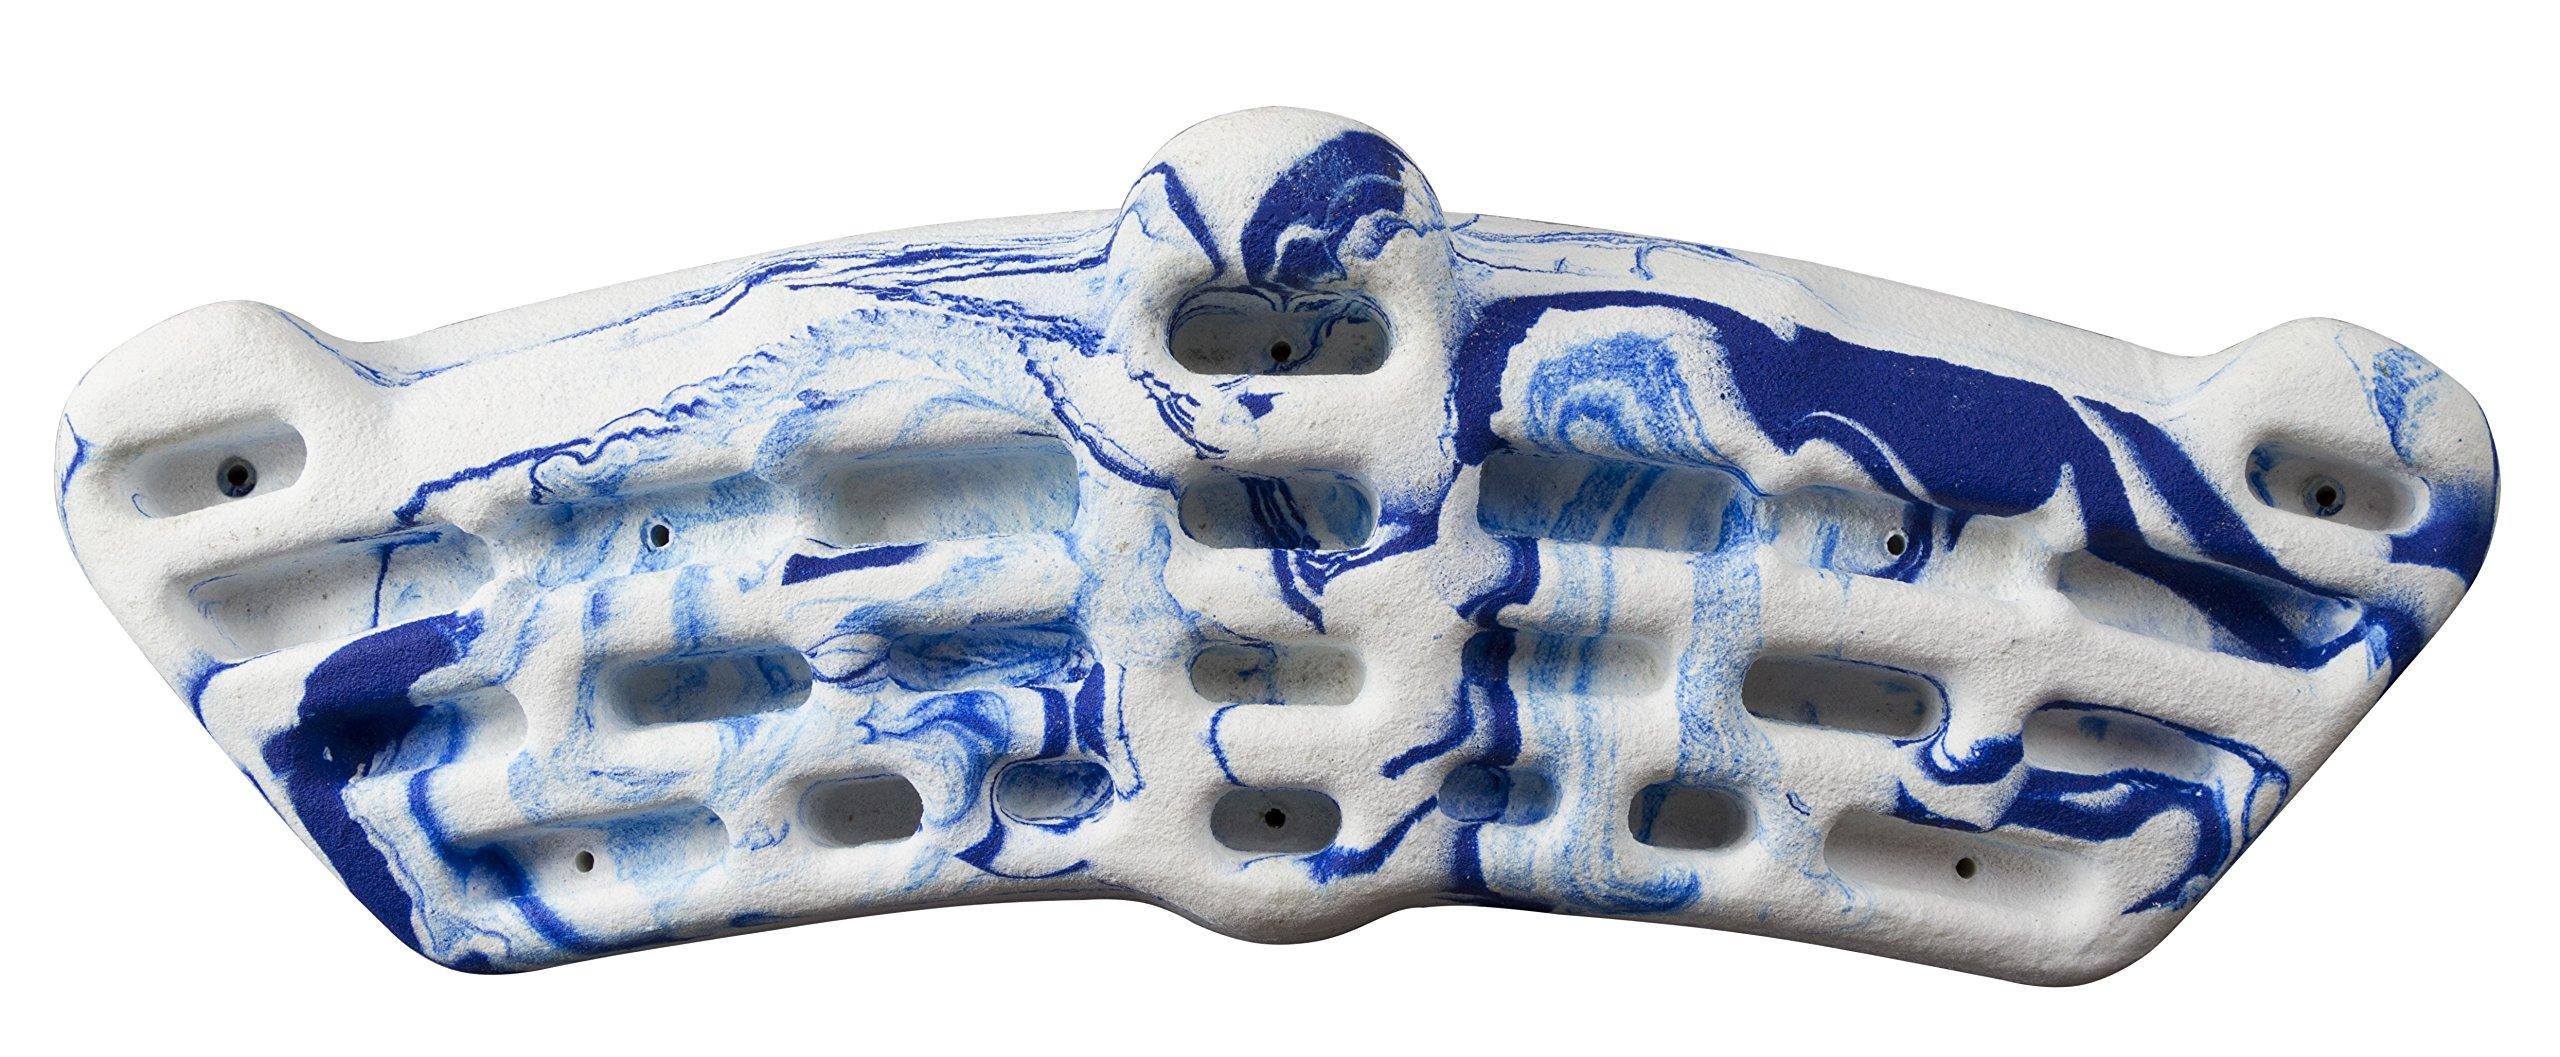 Metolius Simulator 3D Training Board Blue/Blue Swirl One Size